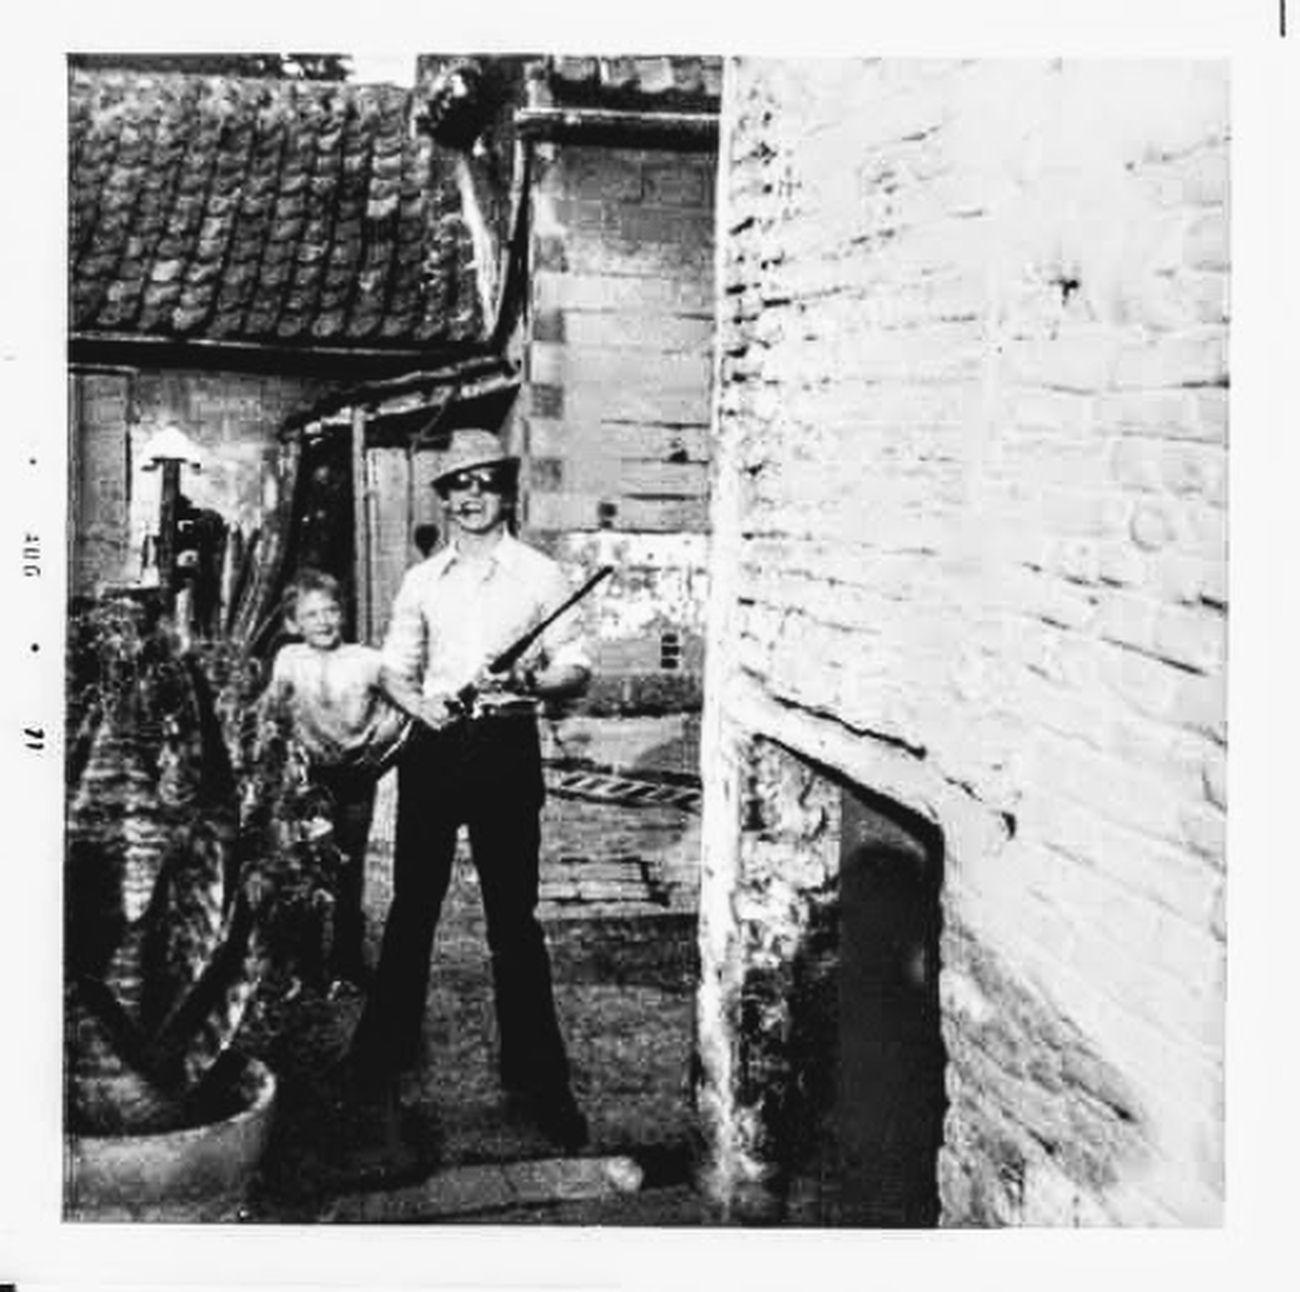 View the entire explanation on https://groetenuittienen.blog/theo-herbots-zwart-wit-fotos-uit-mijn-verleden-black-and-white-photos-from-my-past/